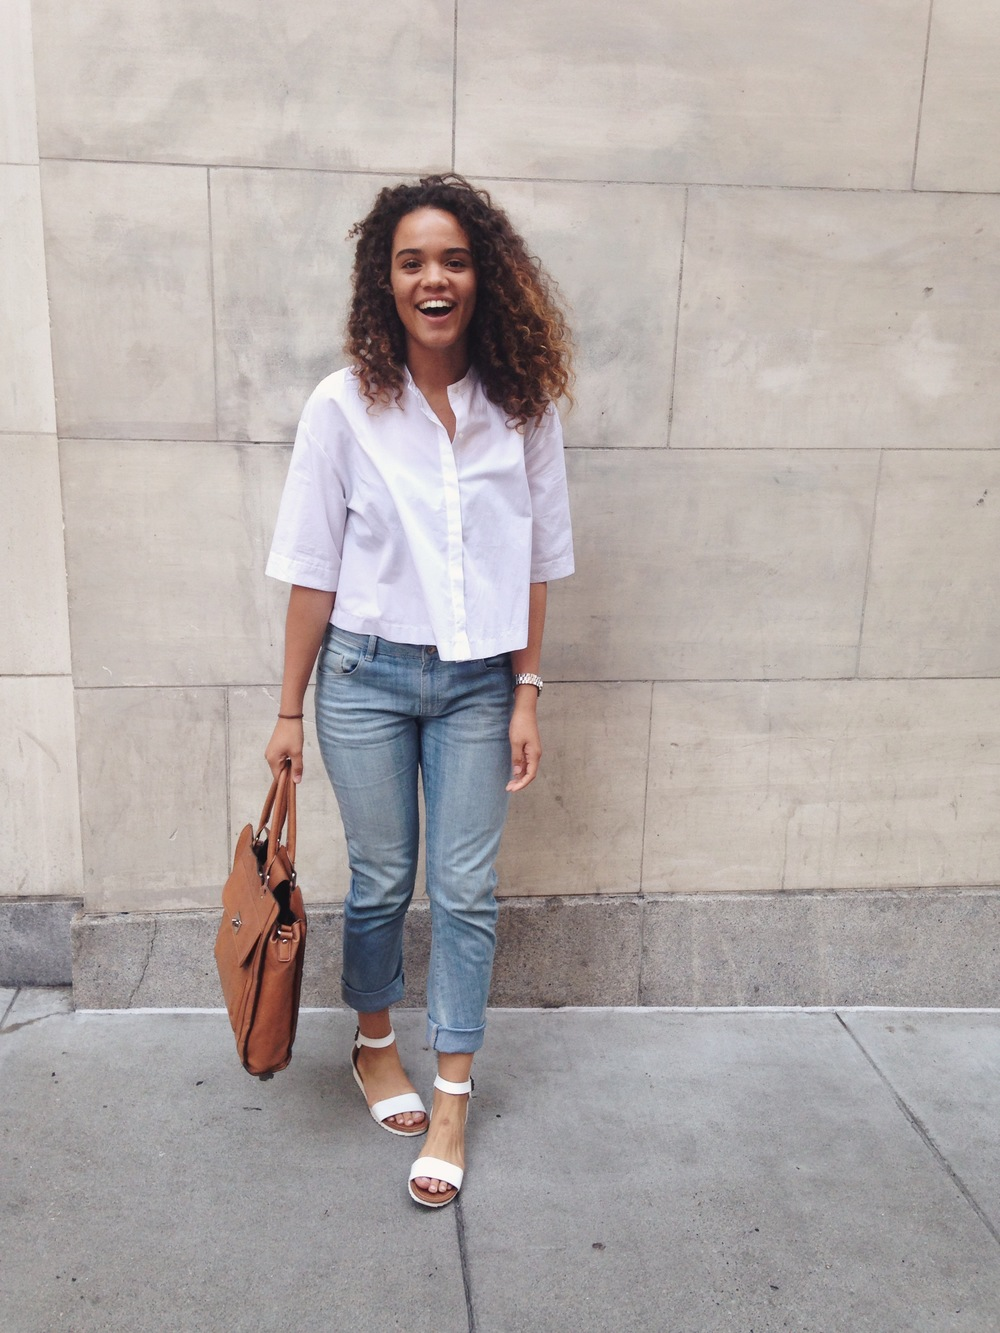 What I Am Wearing: Zara boyfriend jeans, Trafaluc shirt, Mossimo sandals, Merona Bag,